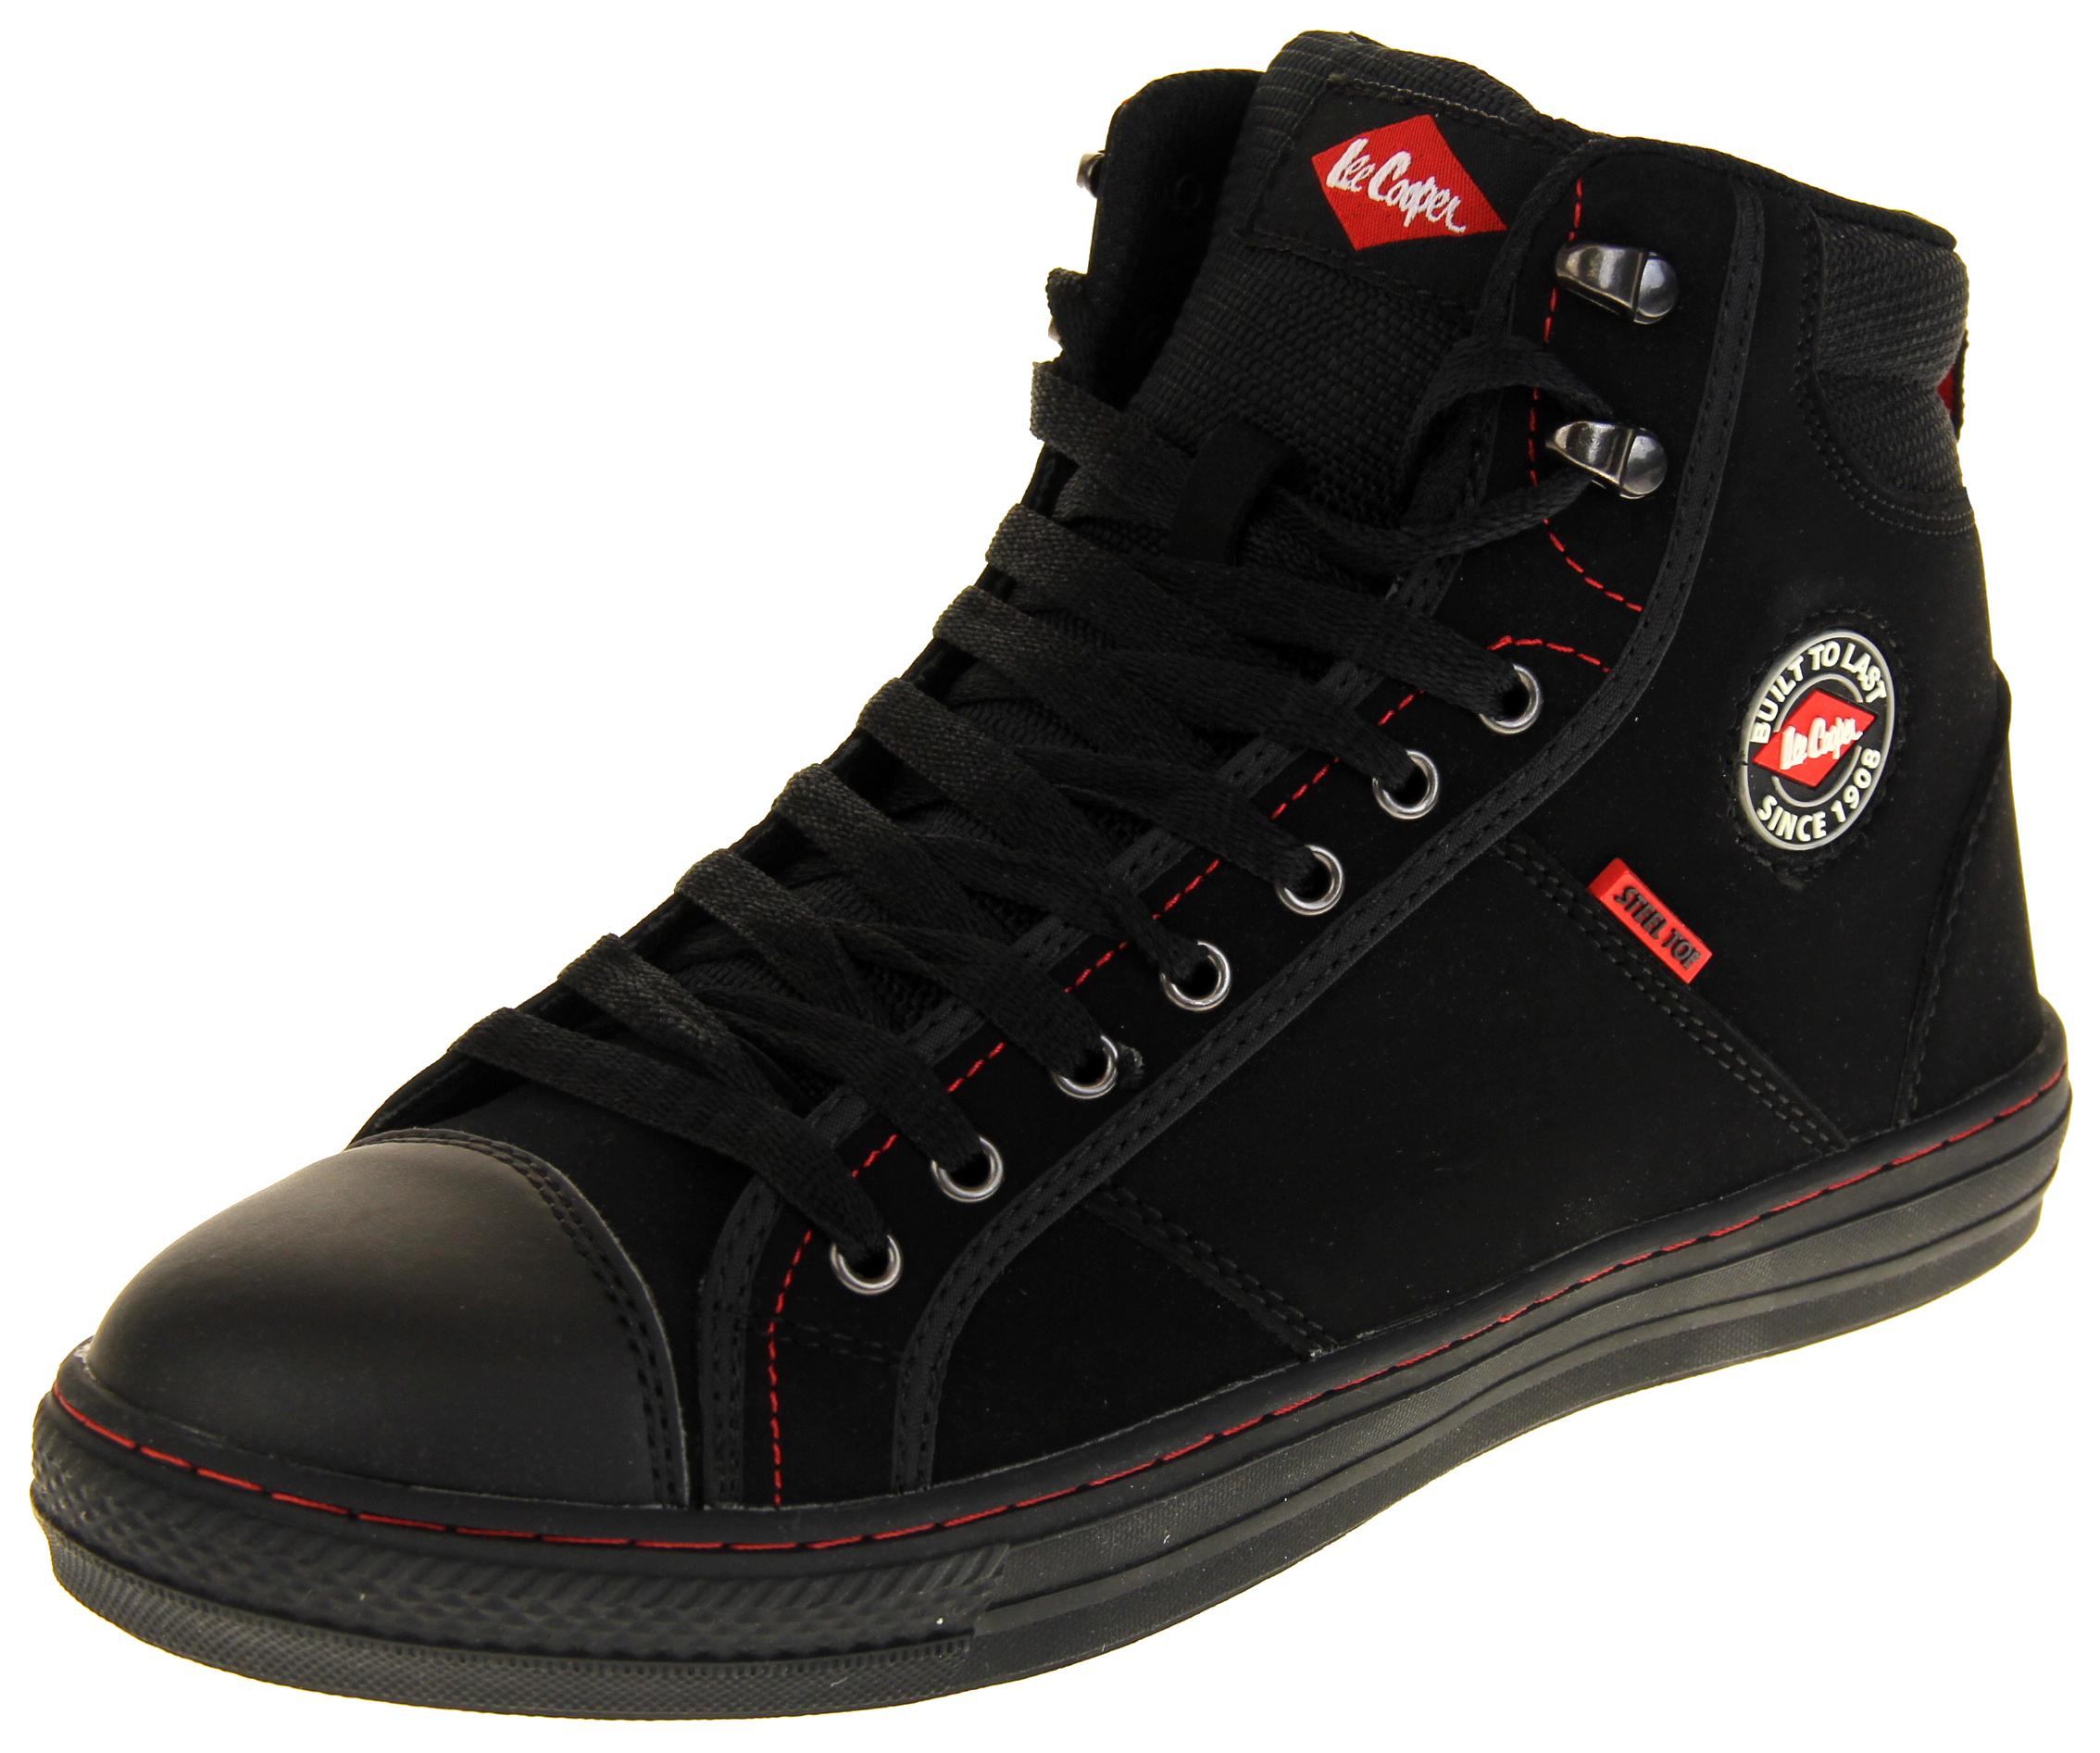 fa6d6b99f18 Mens Lee Cooper Steel Toe Cap Safety Boots